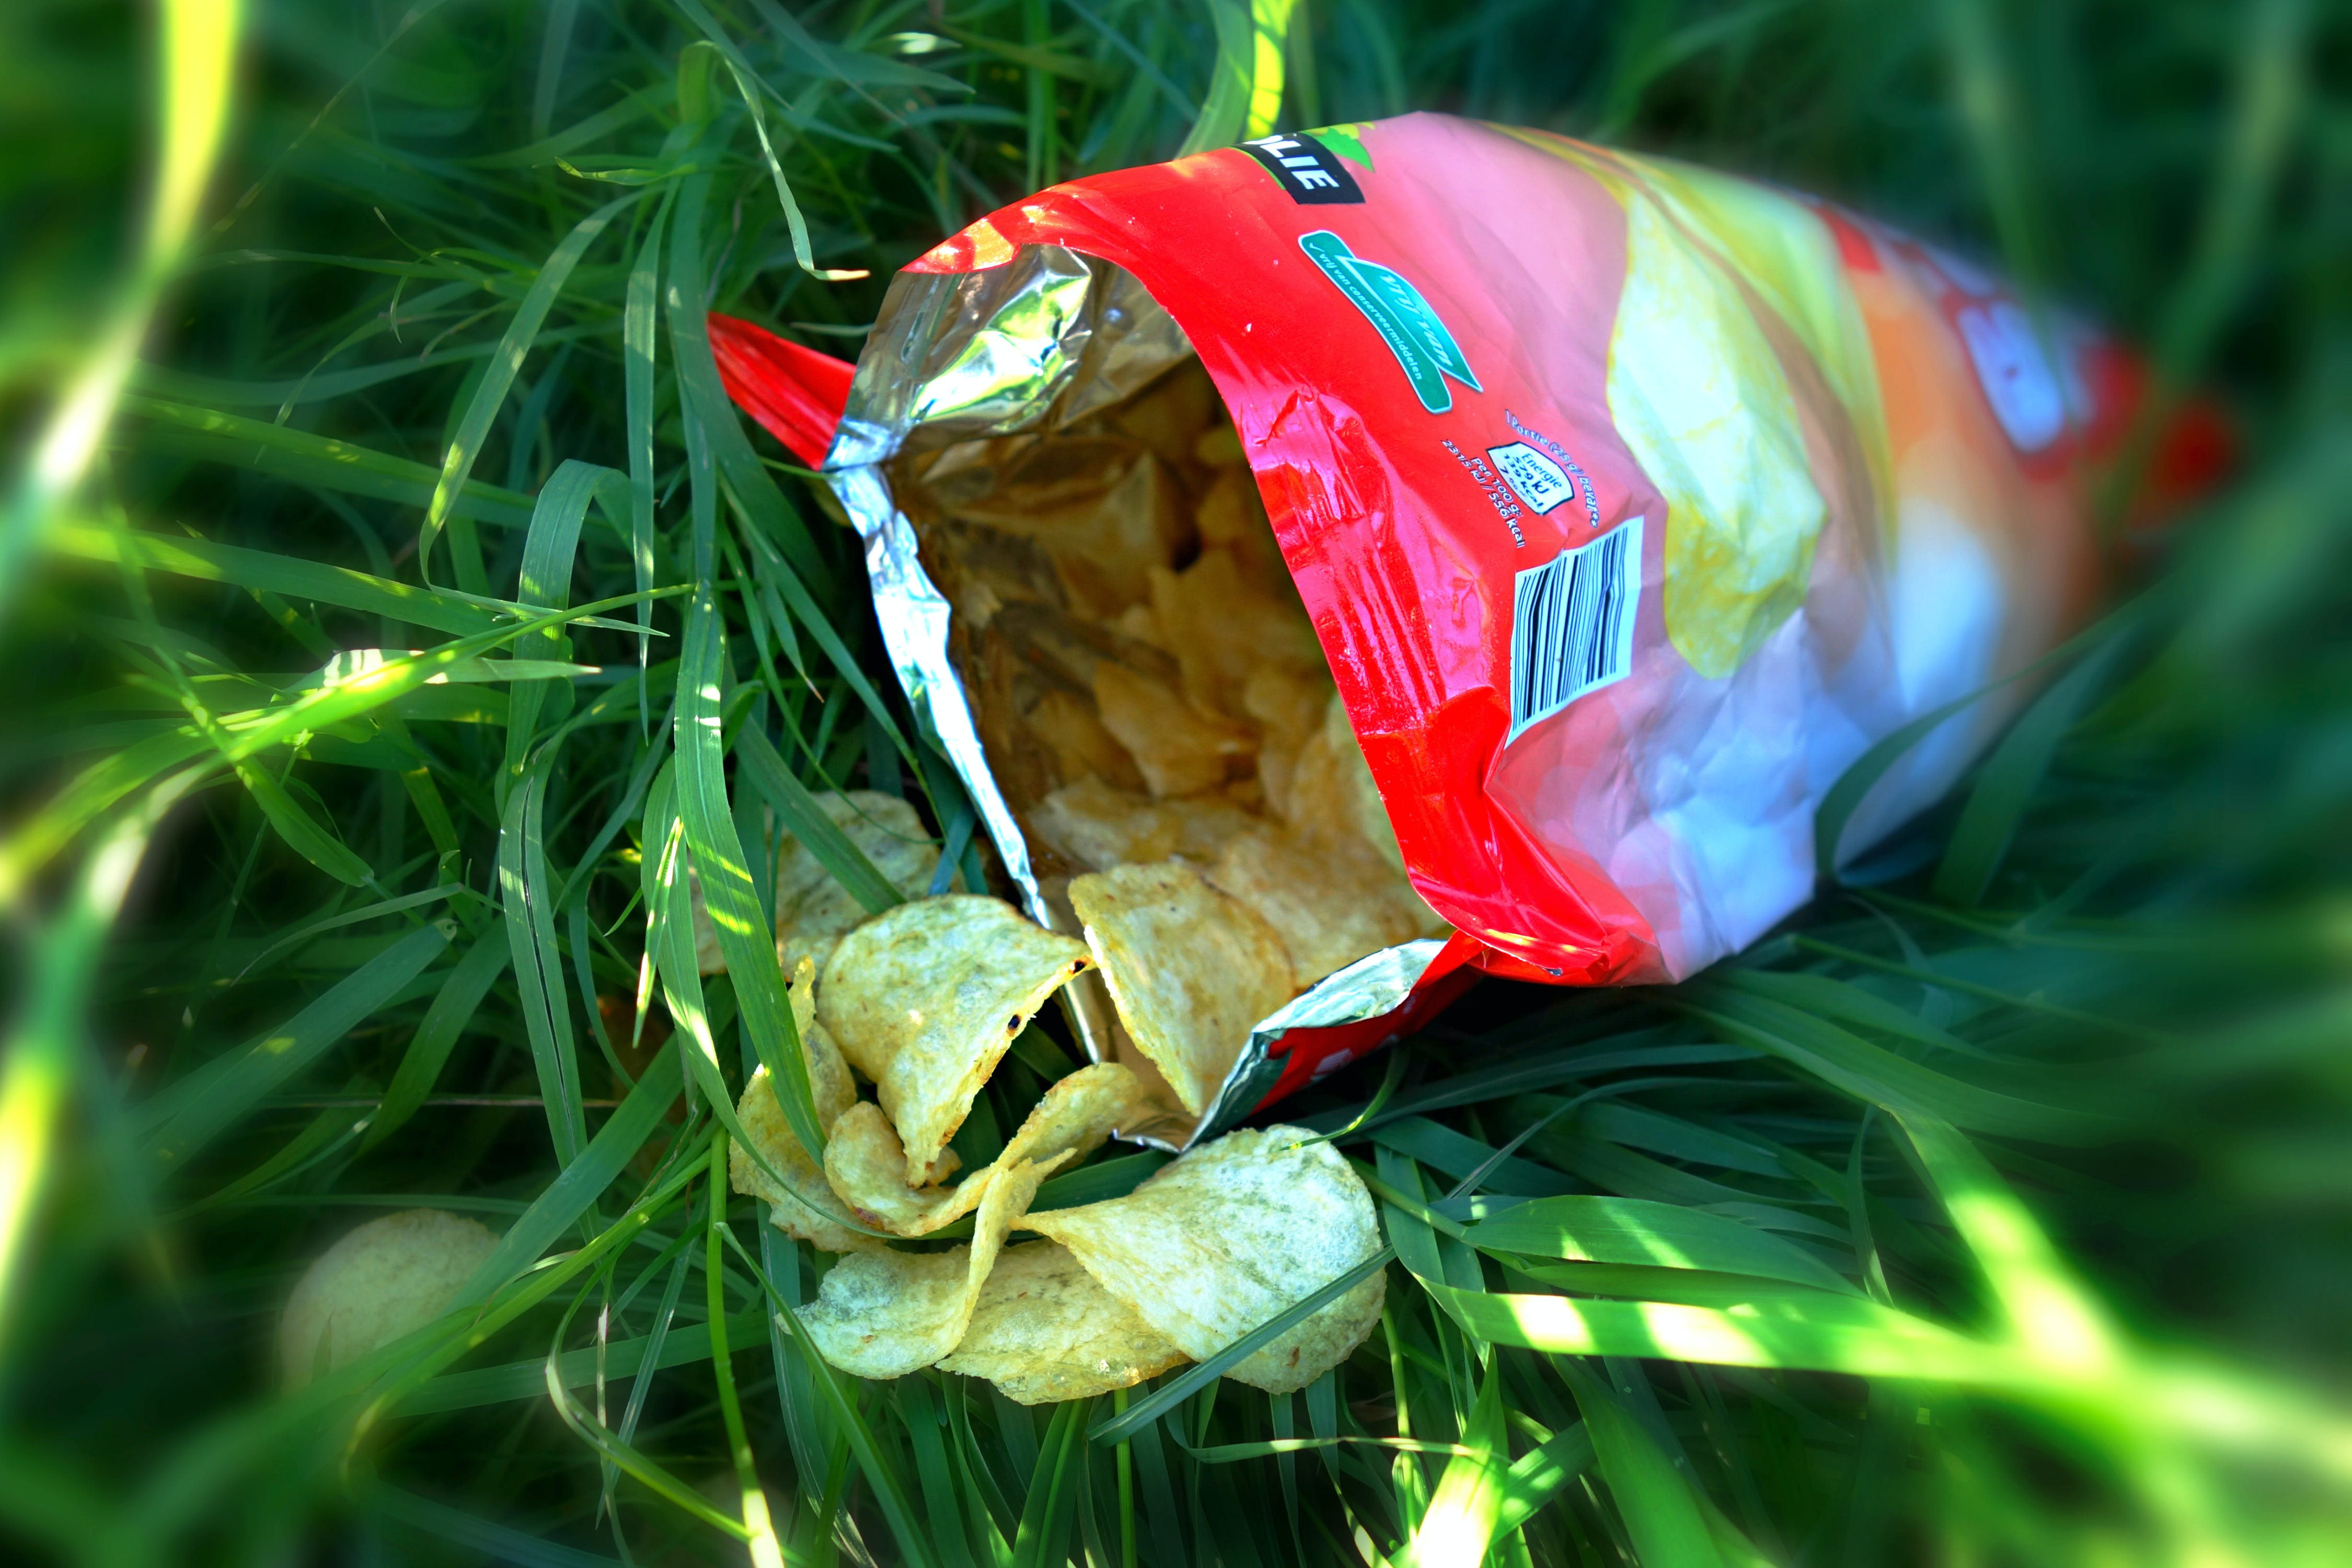 of bag of crisps, calories, crisps, fast-food